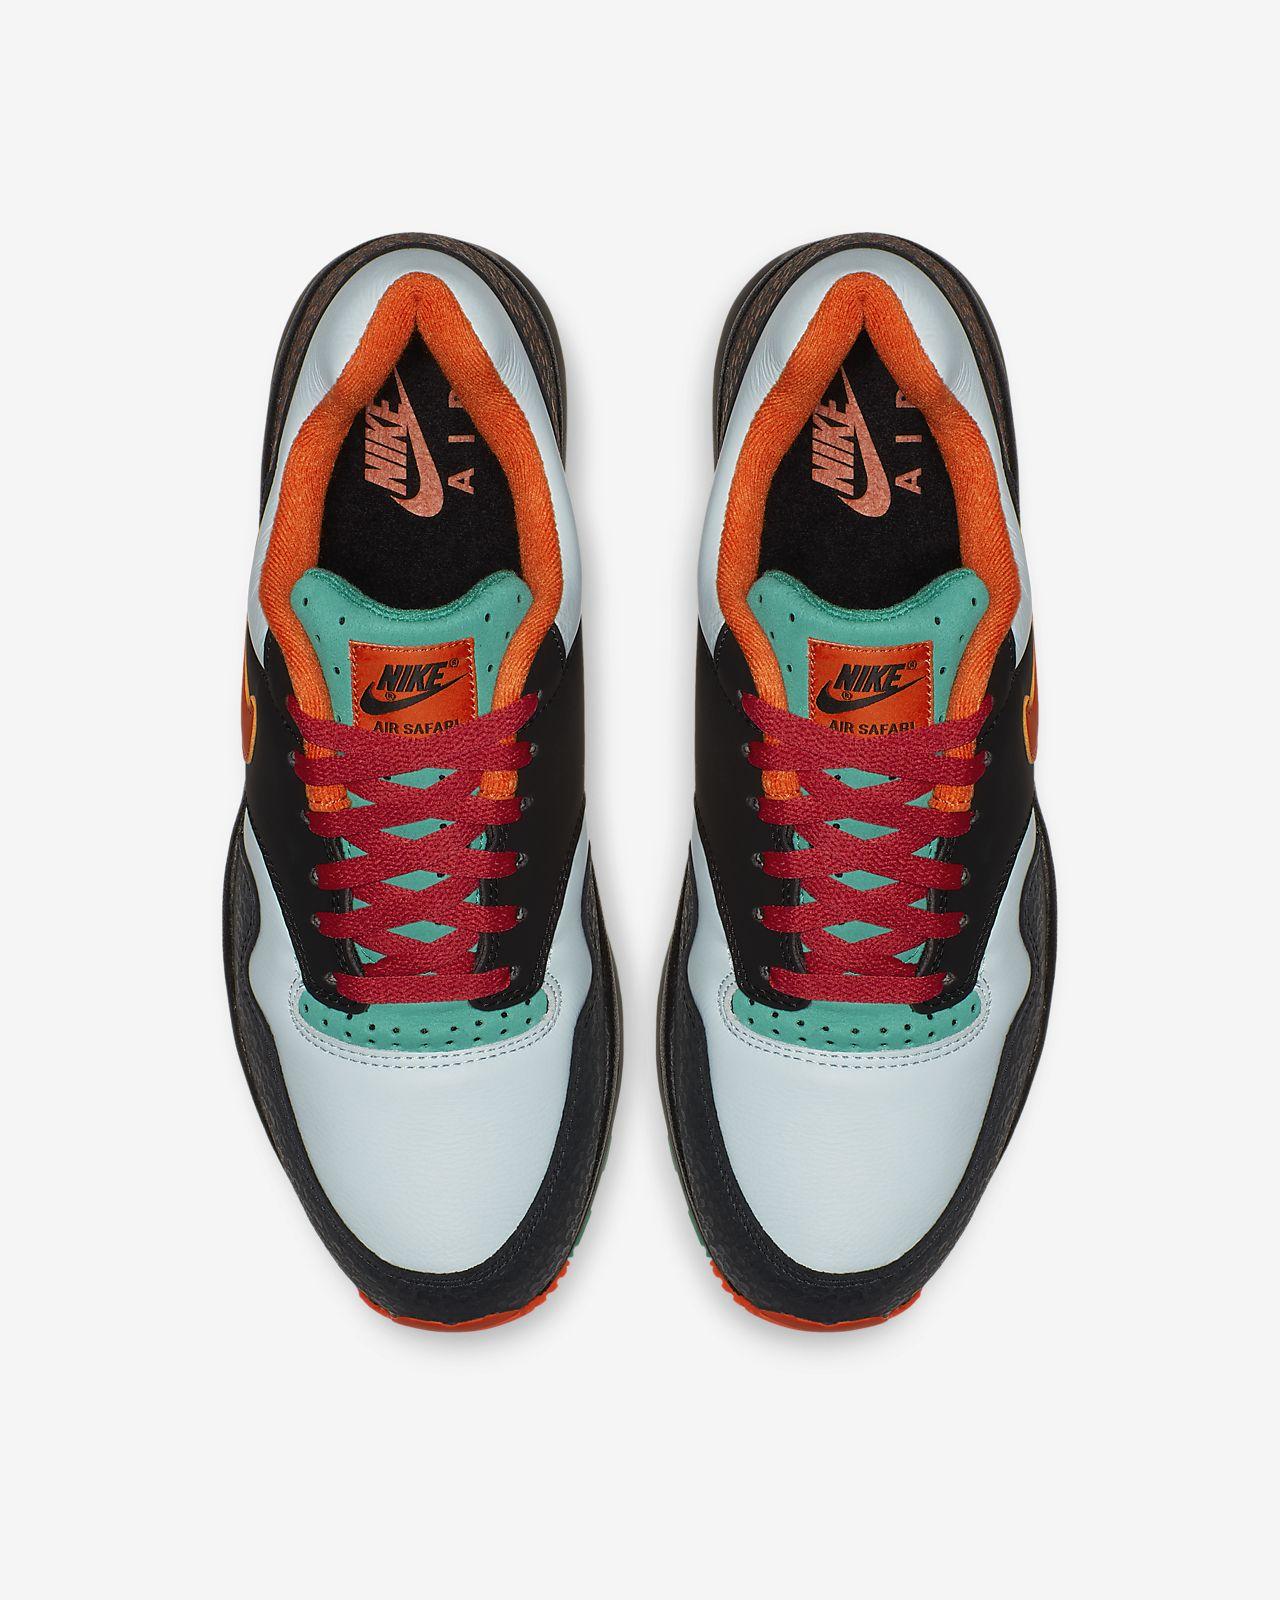 new styles fd7e0 123b1 ... Nike Air Safari SE Herenschoen